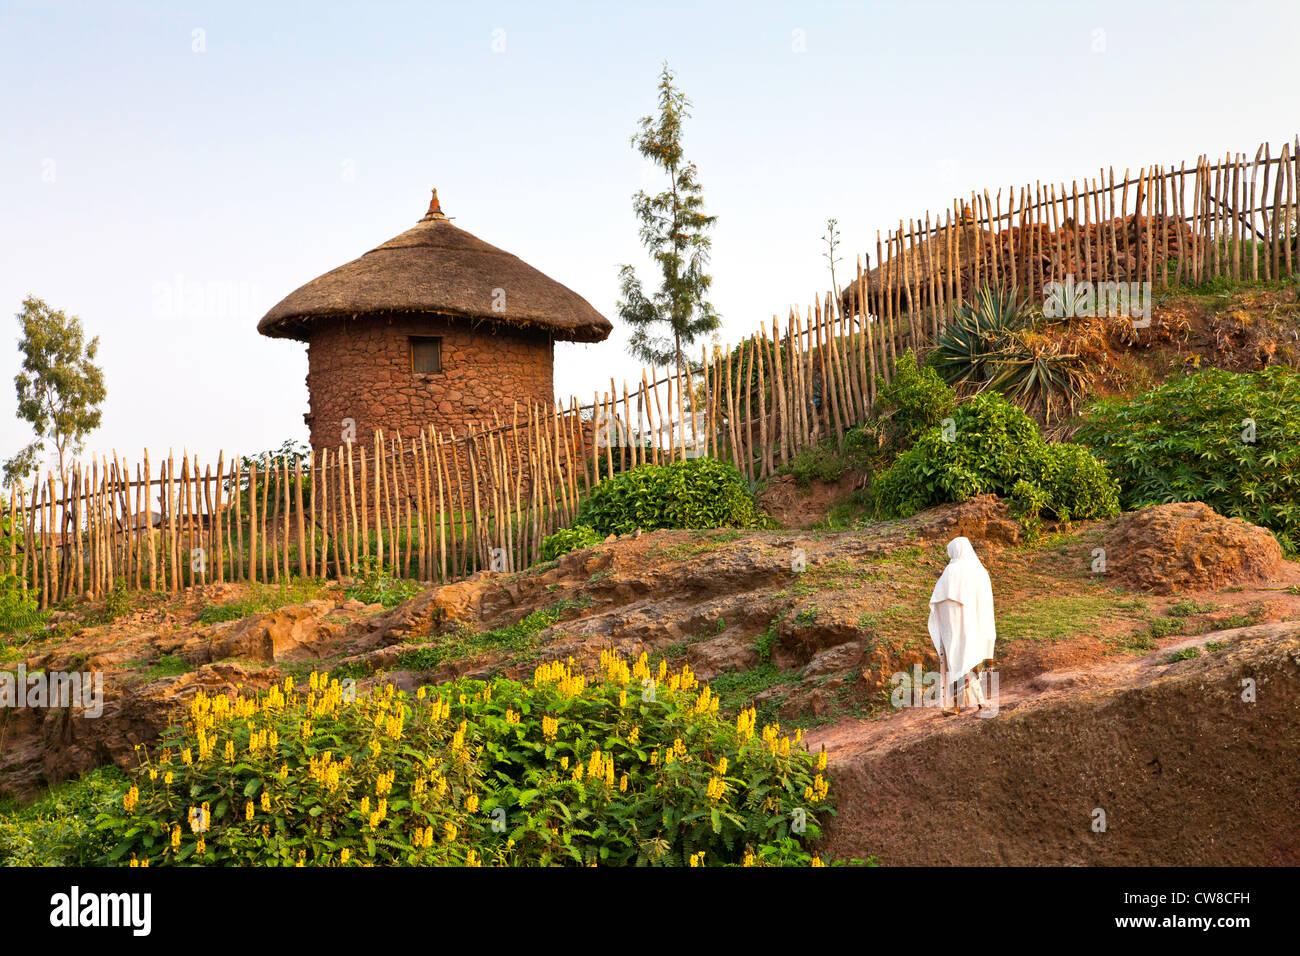 Traditional hut in Lalibela Ethiopia. - Stock Image